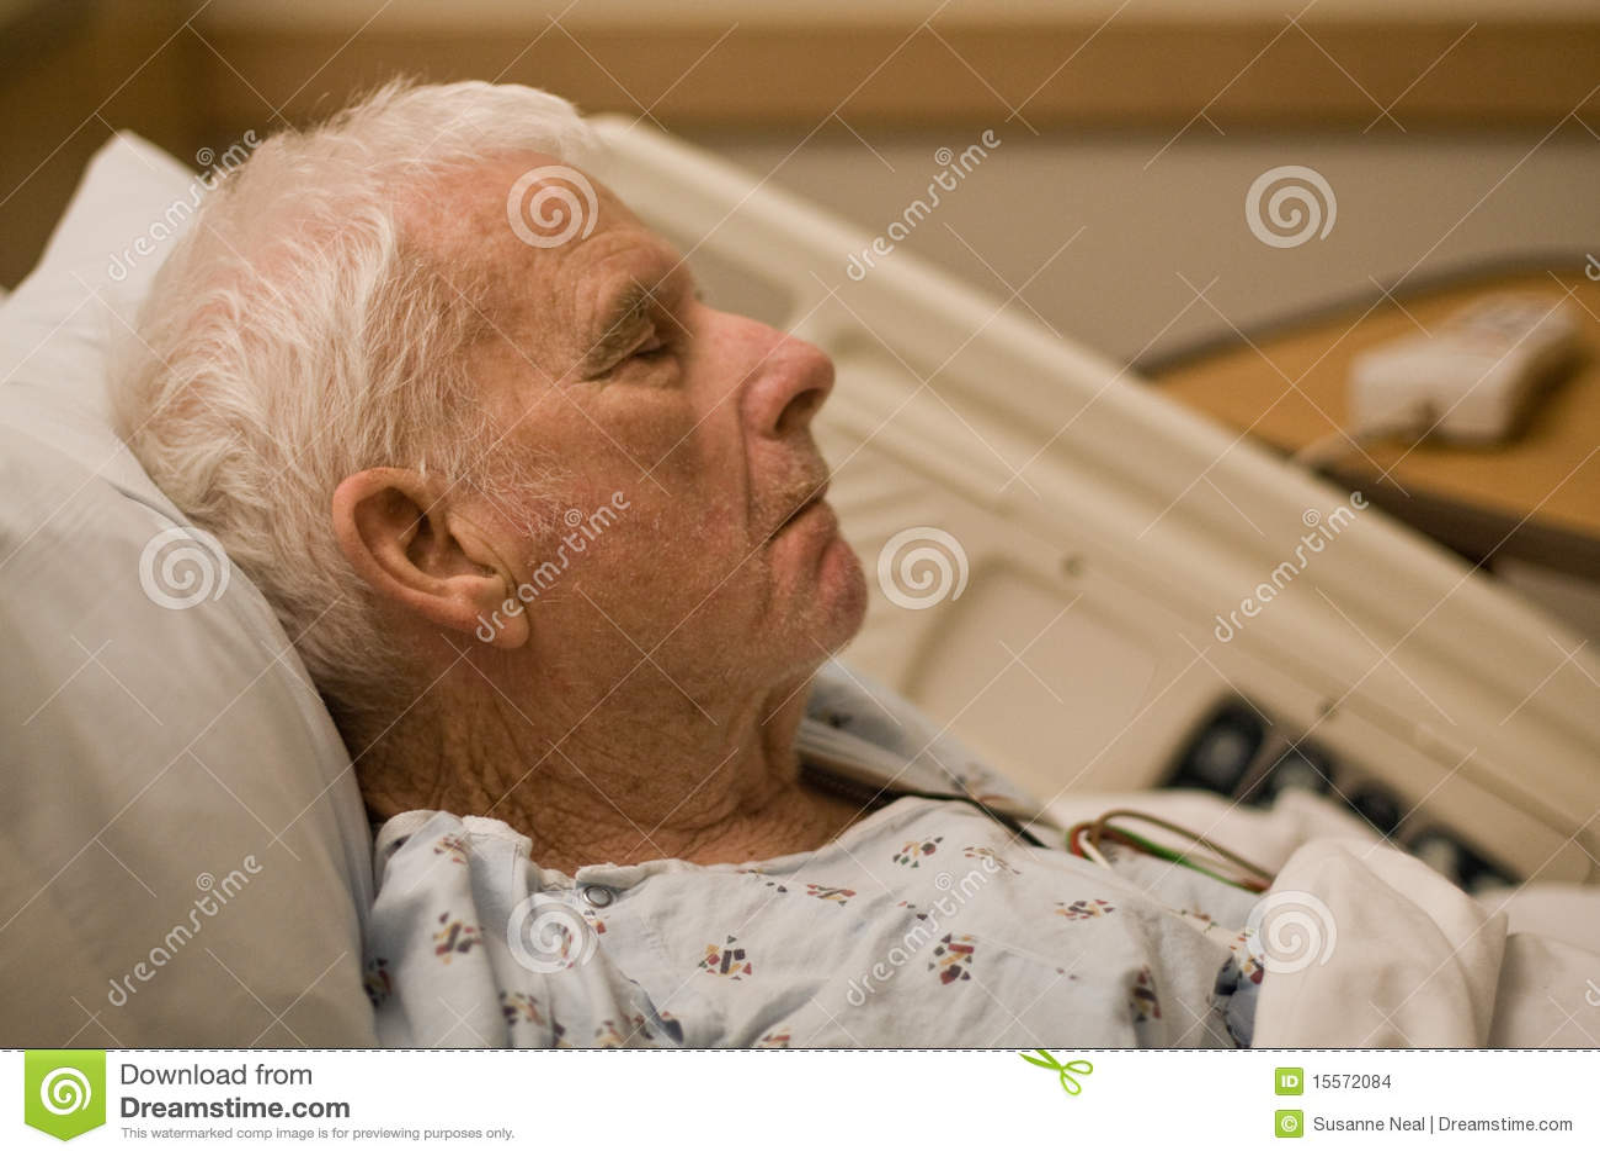 elderly hospital patient sleeping stock images image